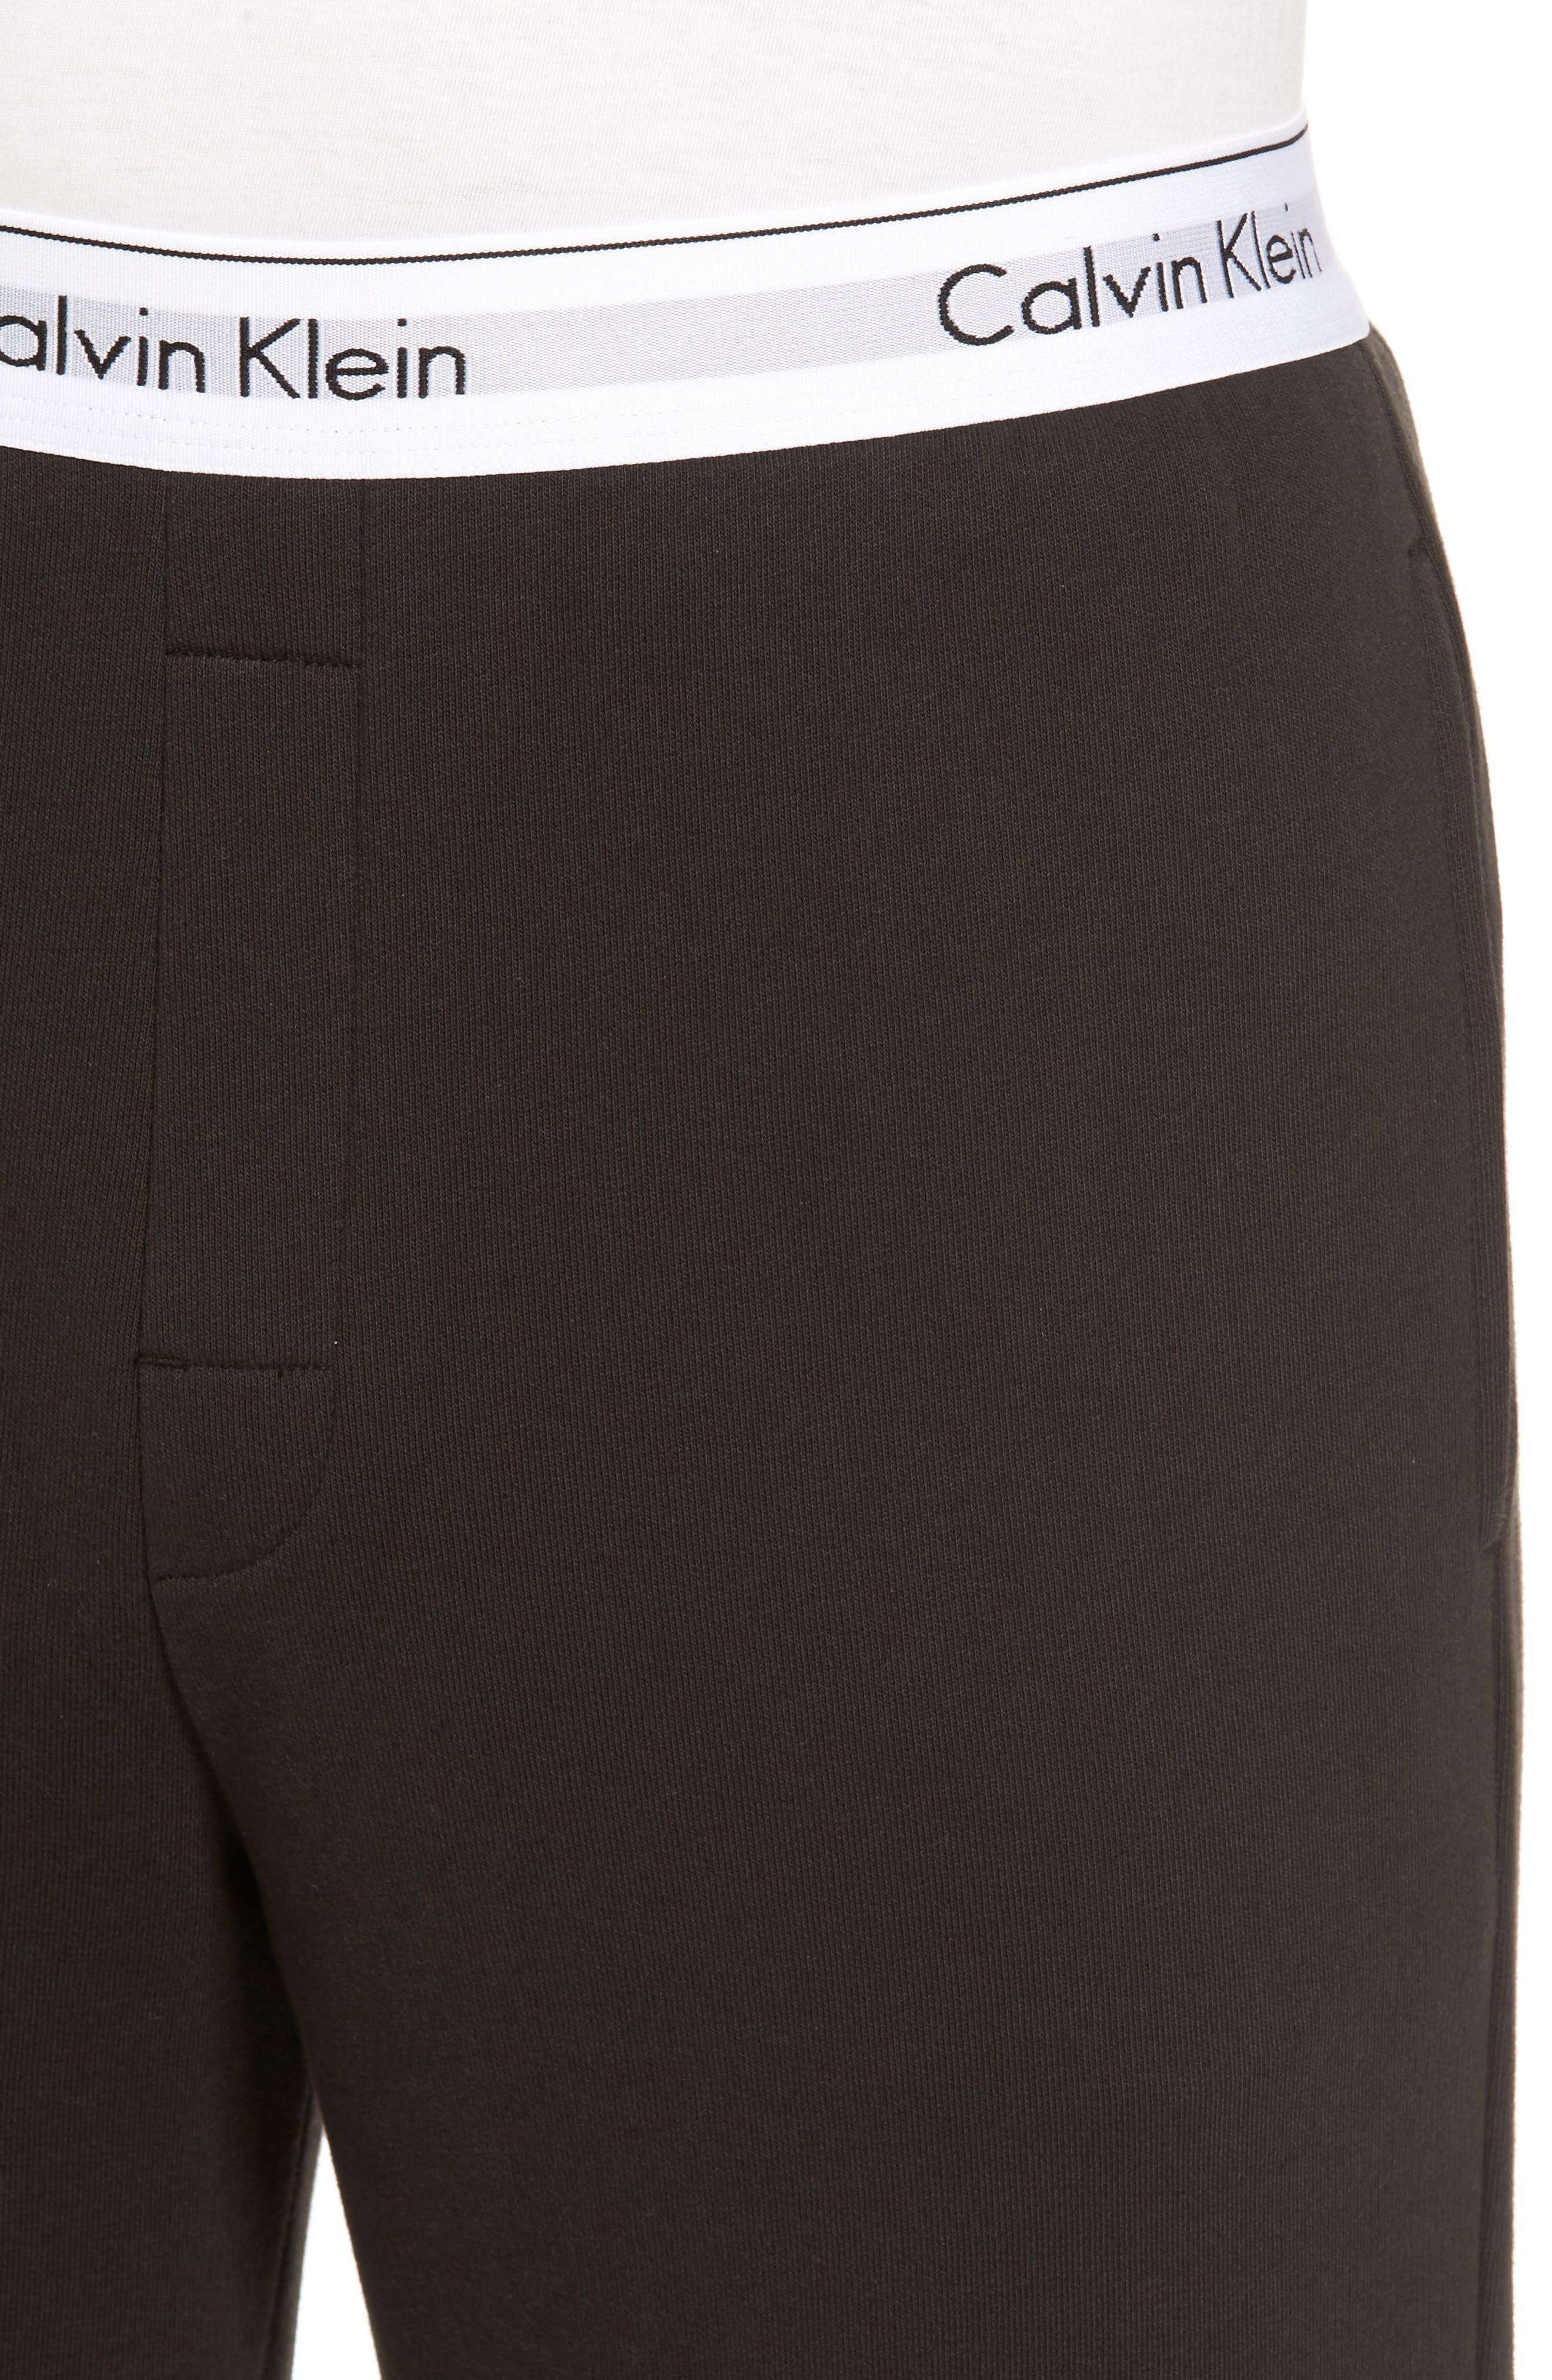 Modern Cotton Blend Lounge Pants,                             Alternate thumbnail 4, color,                             002